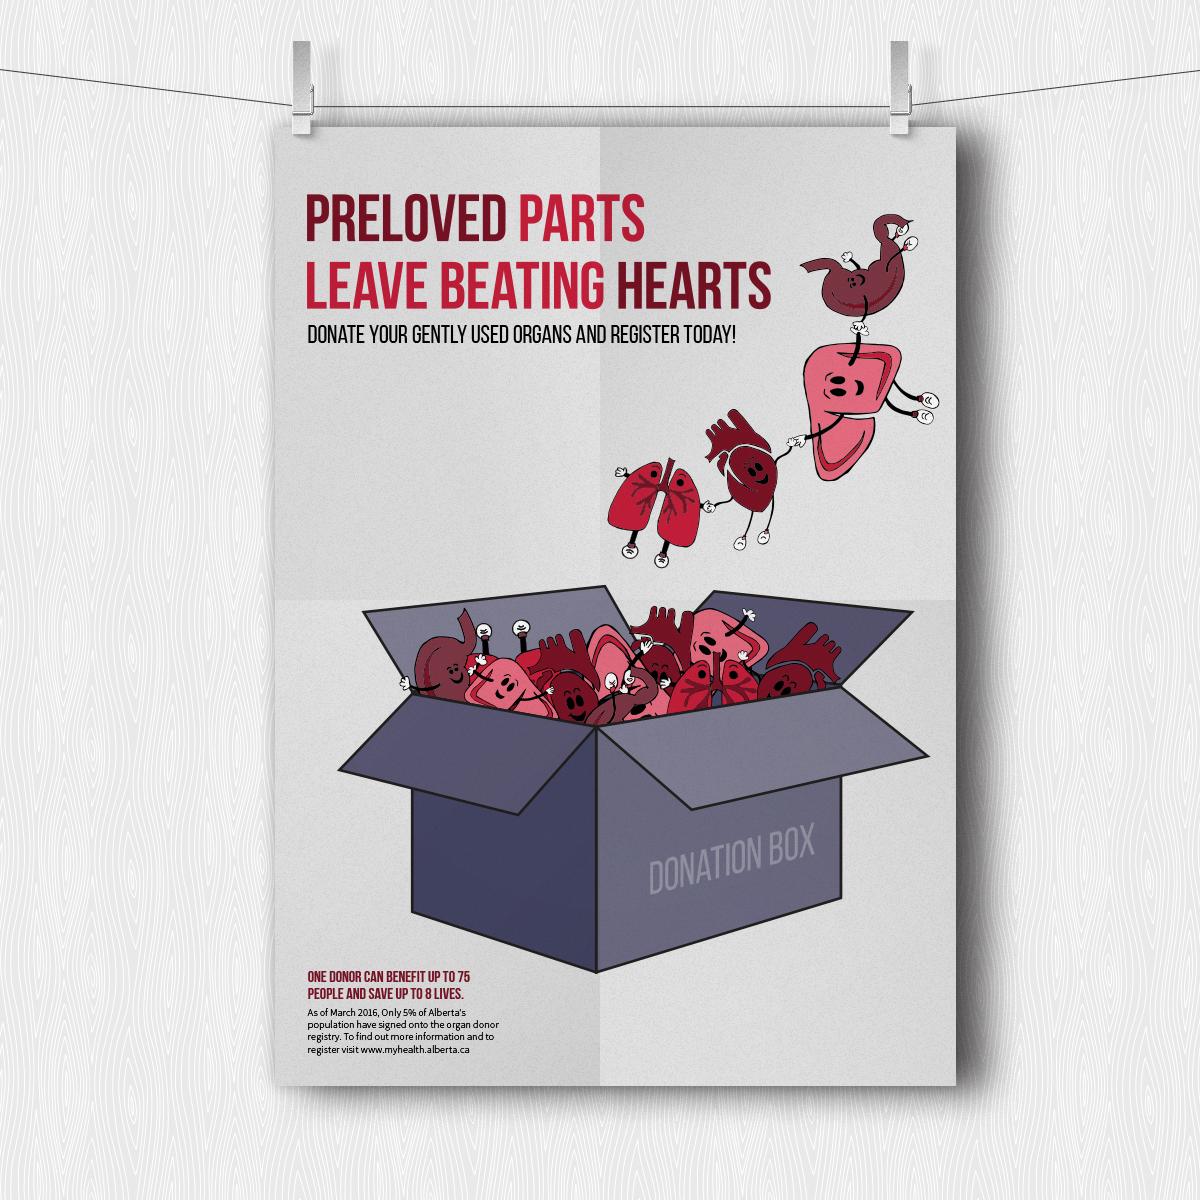 Preloved Parts